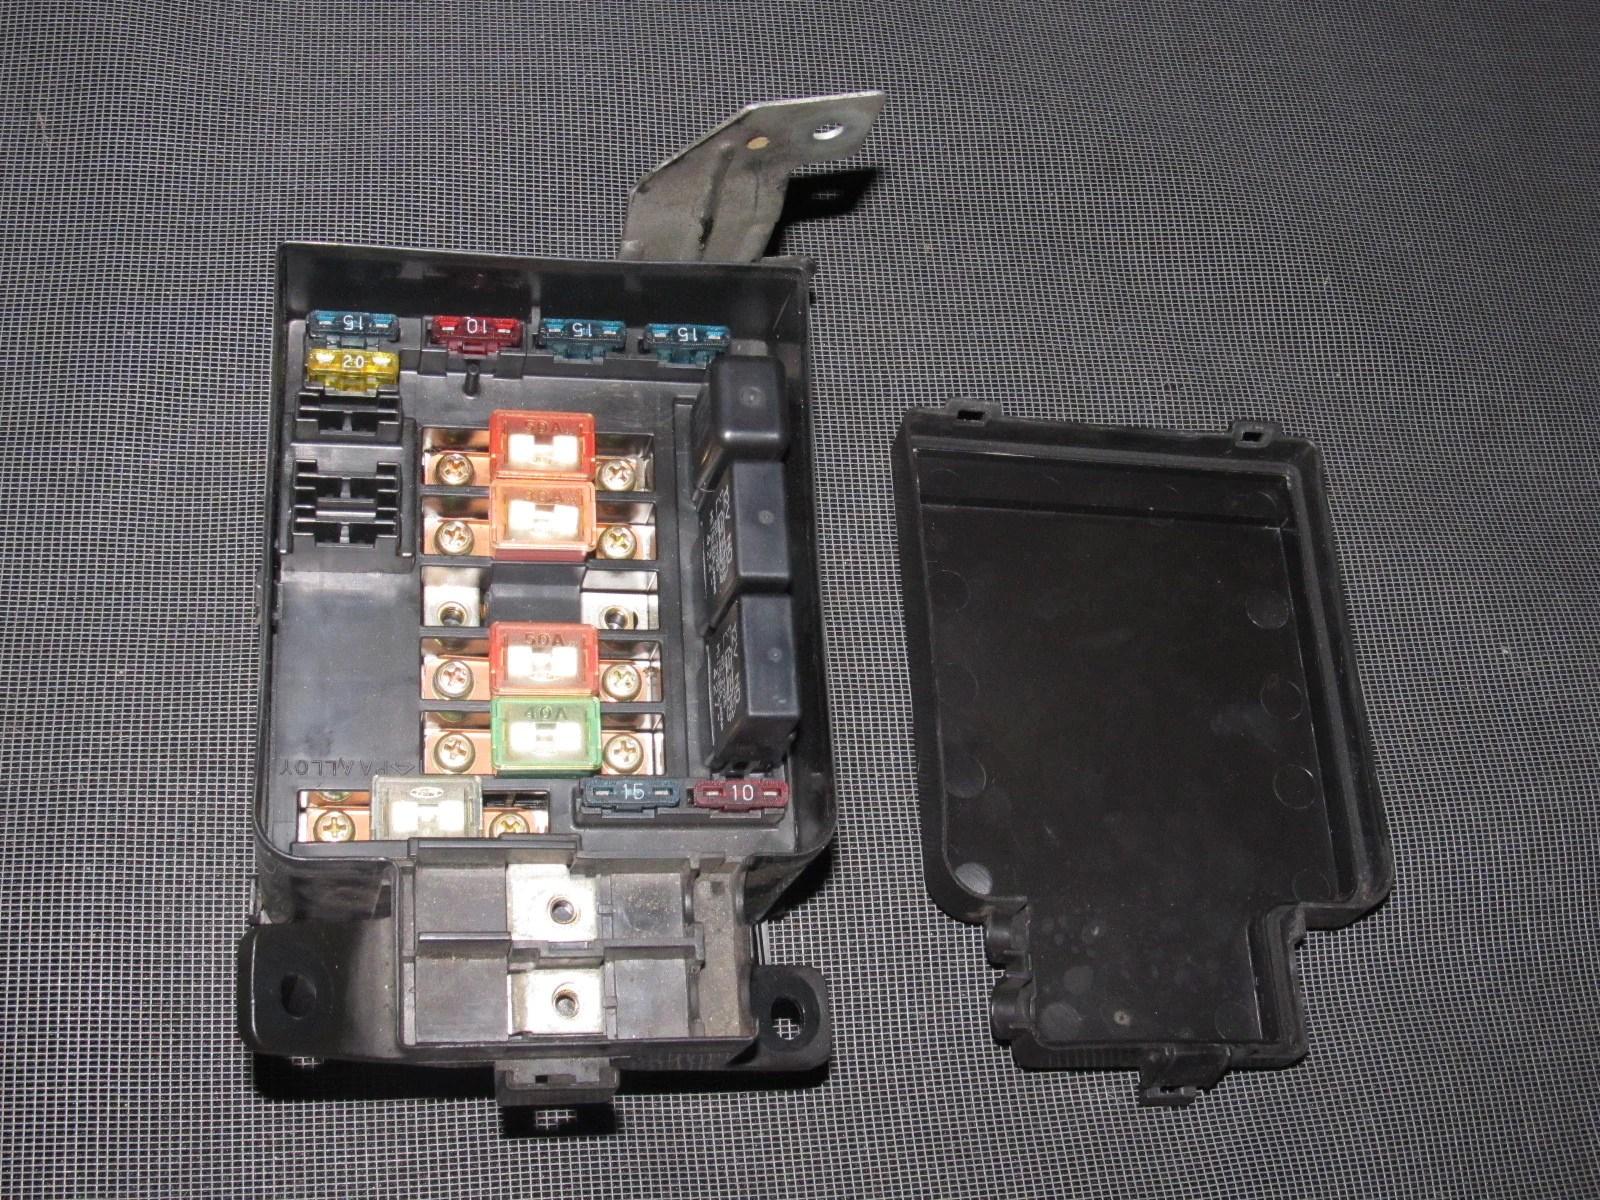 medium resolution of  93 94 95 honda del sol oem b16 engine fuse box with relays